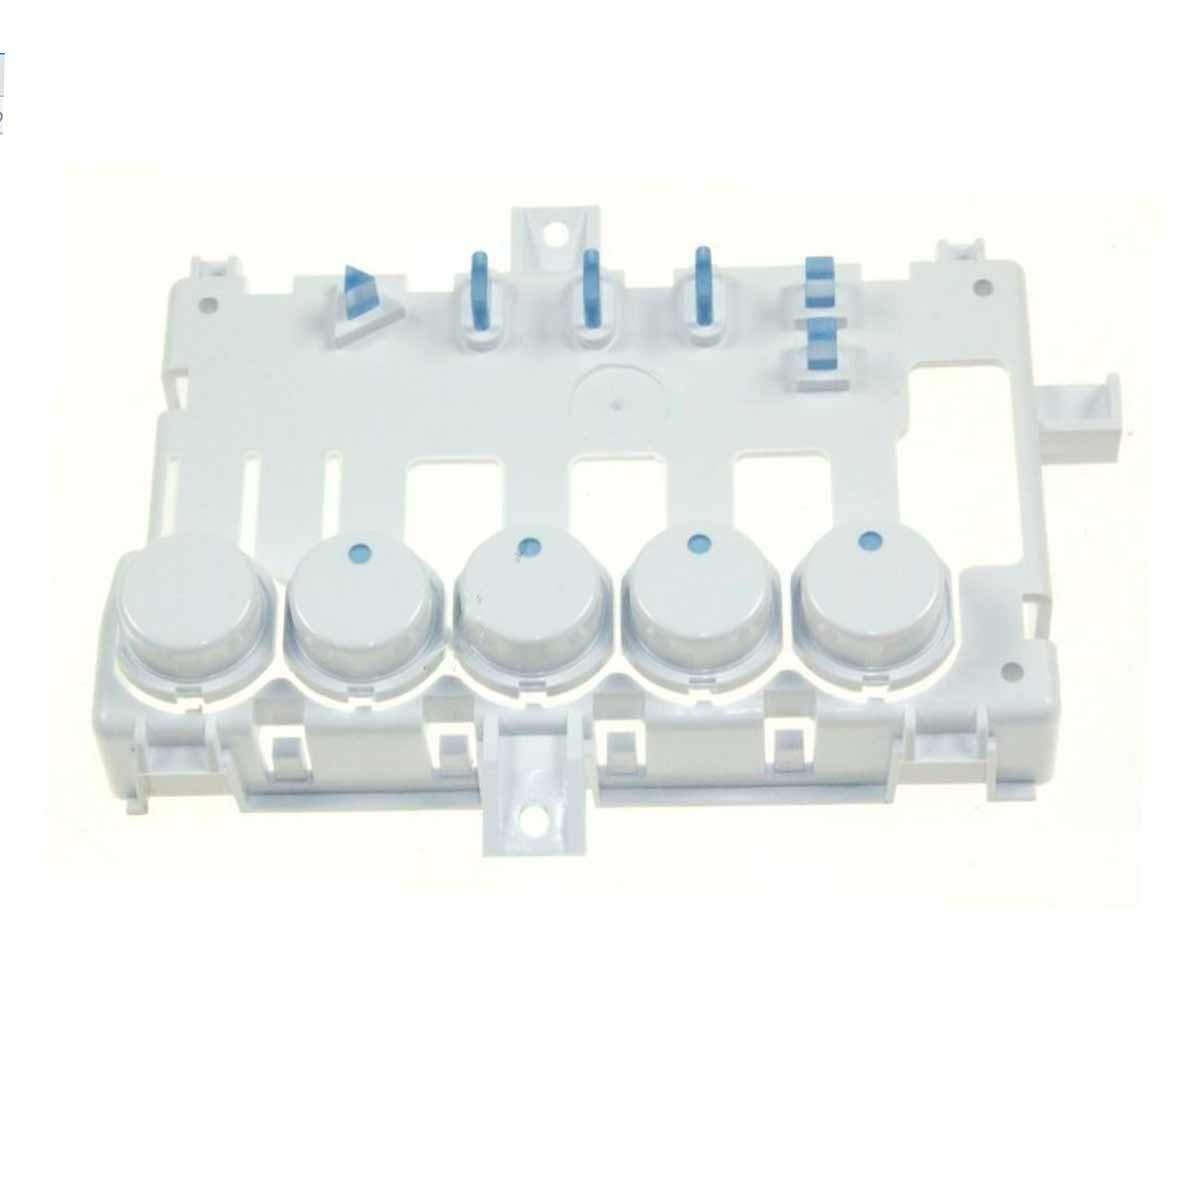 Recamania Teclado botonera Lavadora Otsein OHNF6117-3 41010366 ...